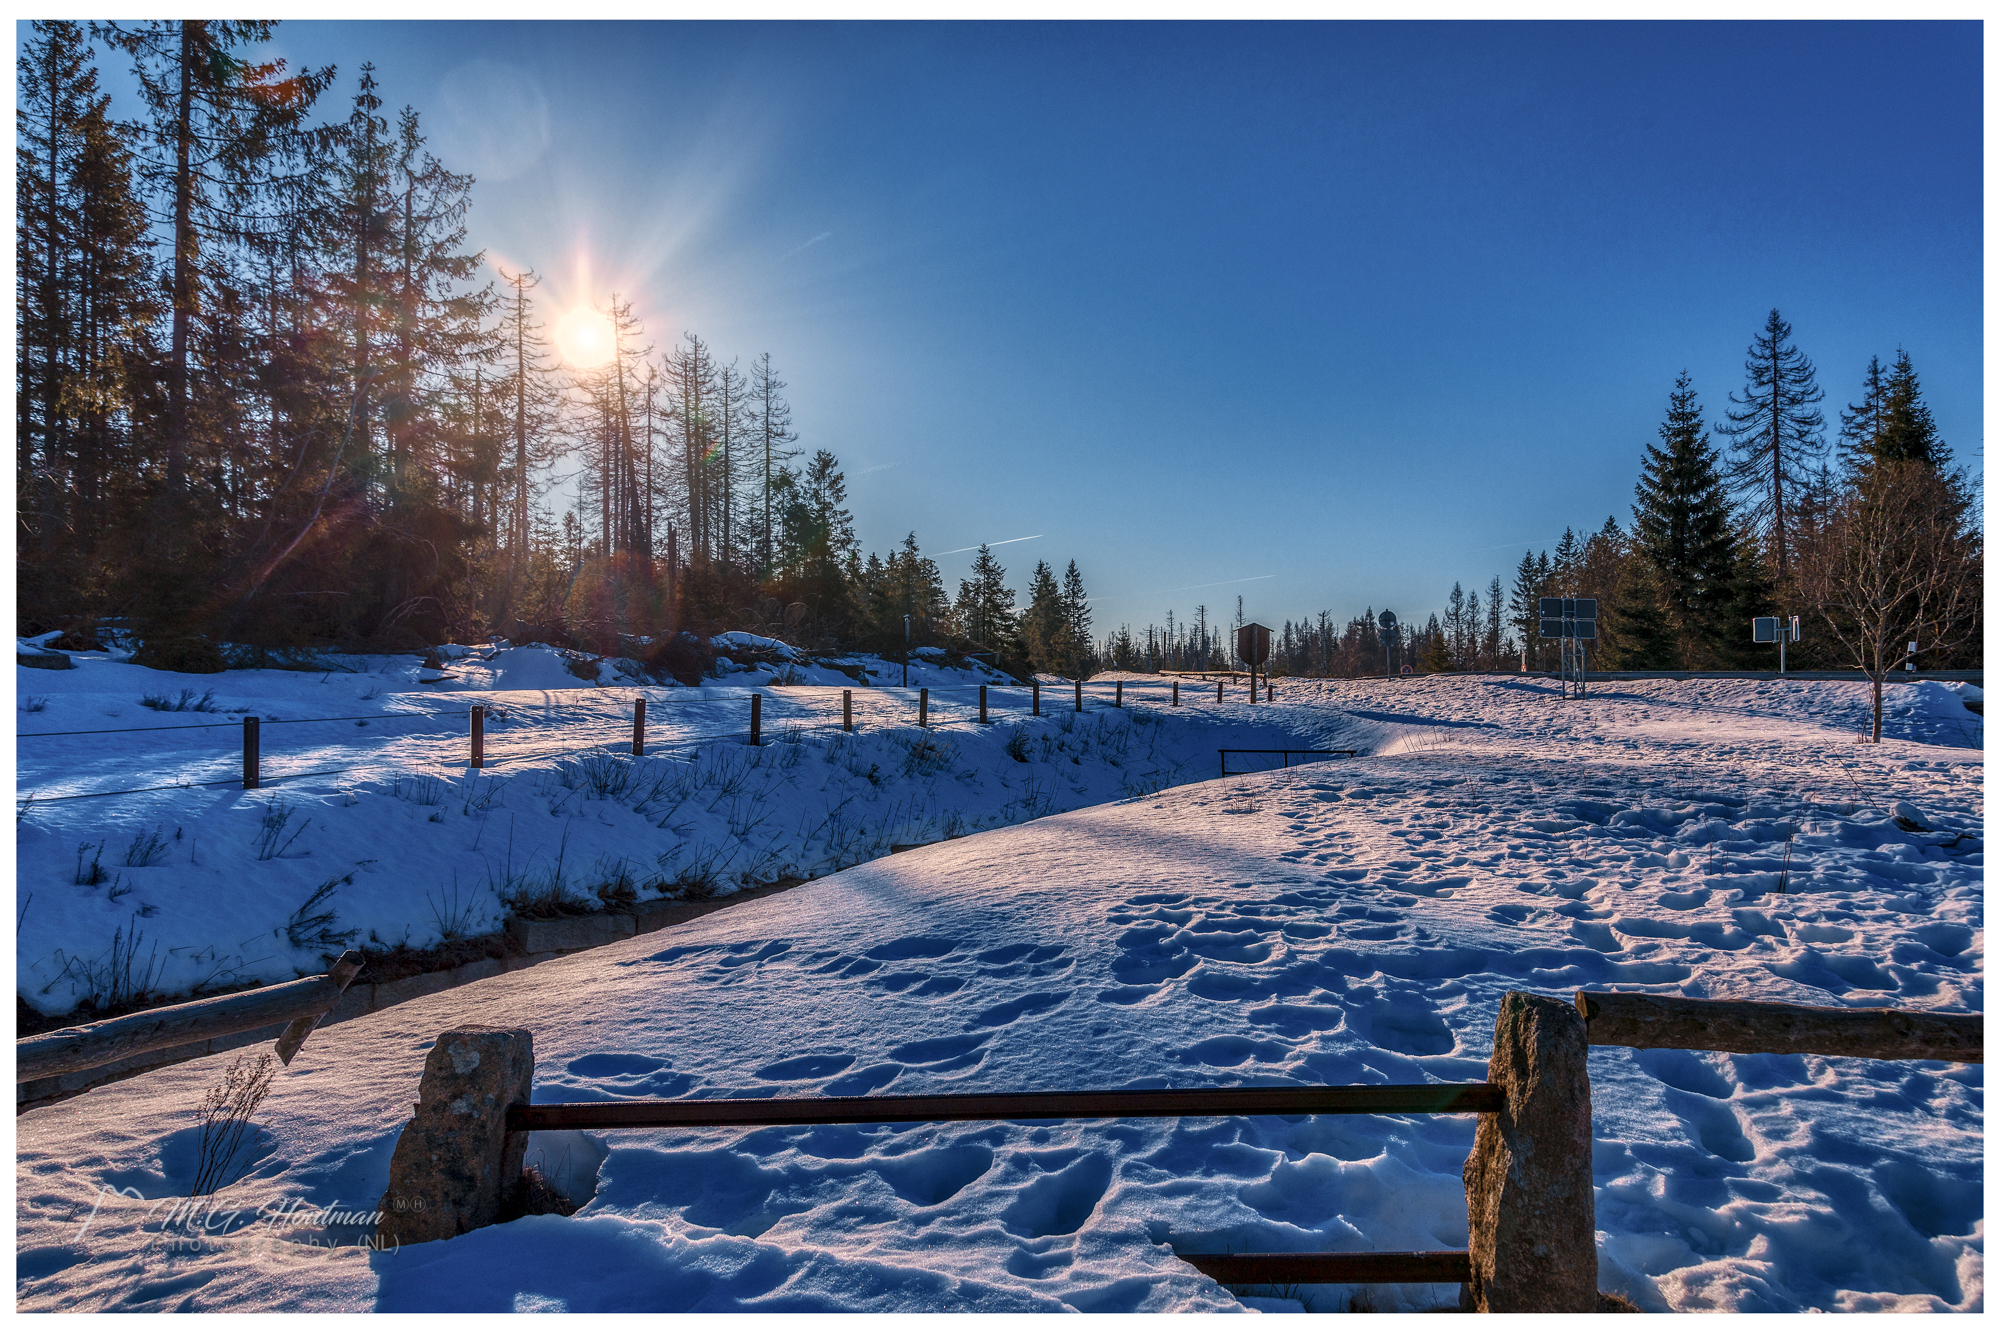 Winterwalk in the Harz